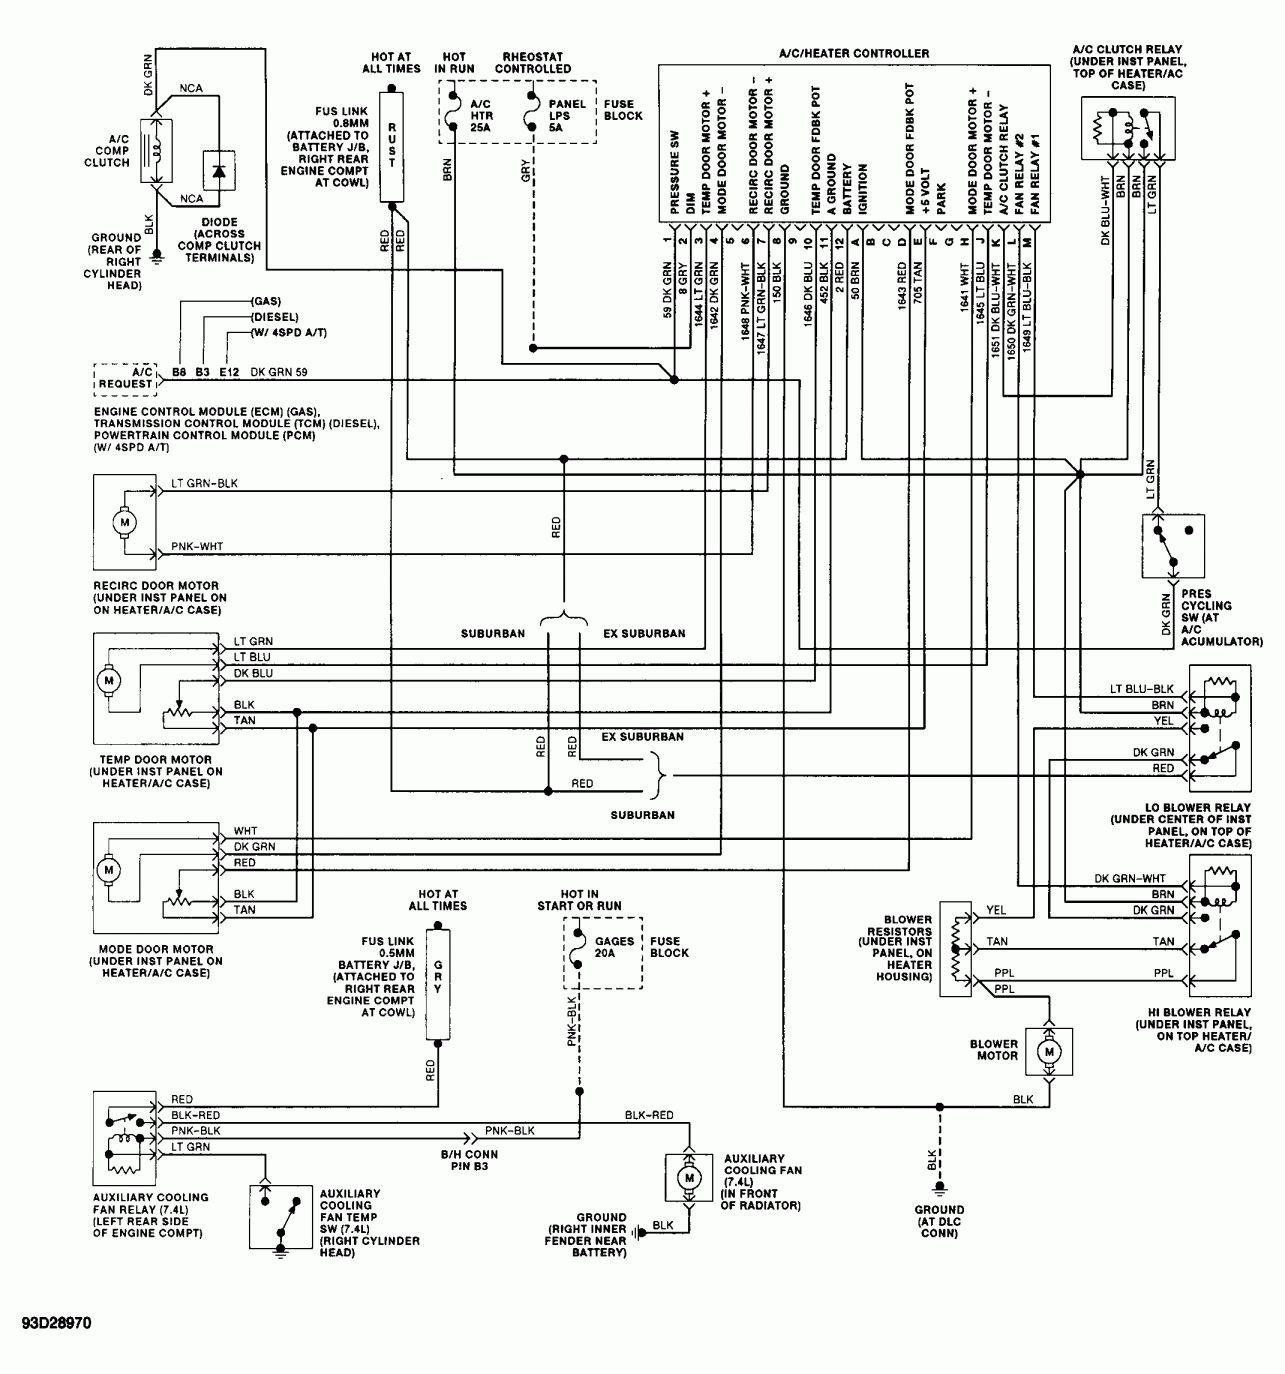 16+ 1993 chevy truck wiring diagram - truck diagram - wiringg.net | chevy  trucks, 79 chevy truck, 1993 chevy silverado  pinterest